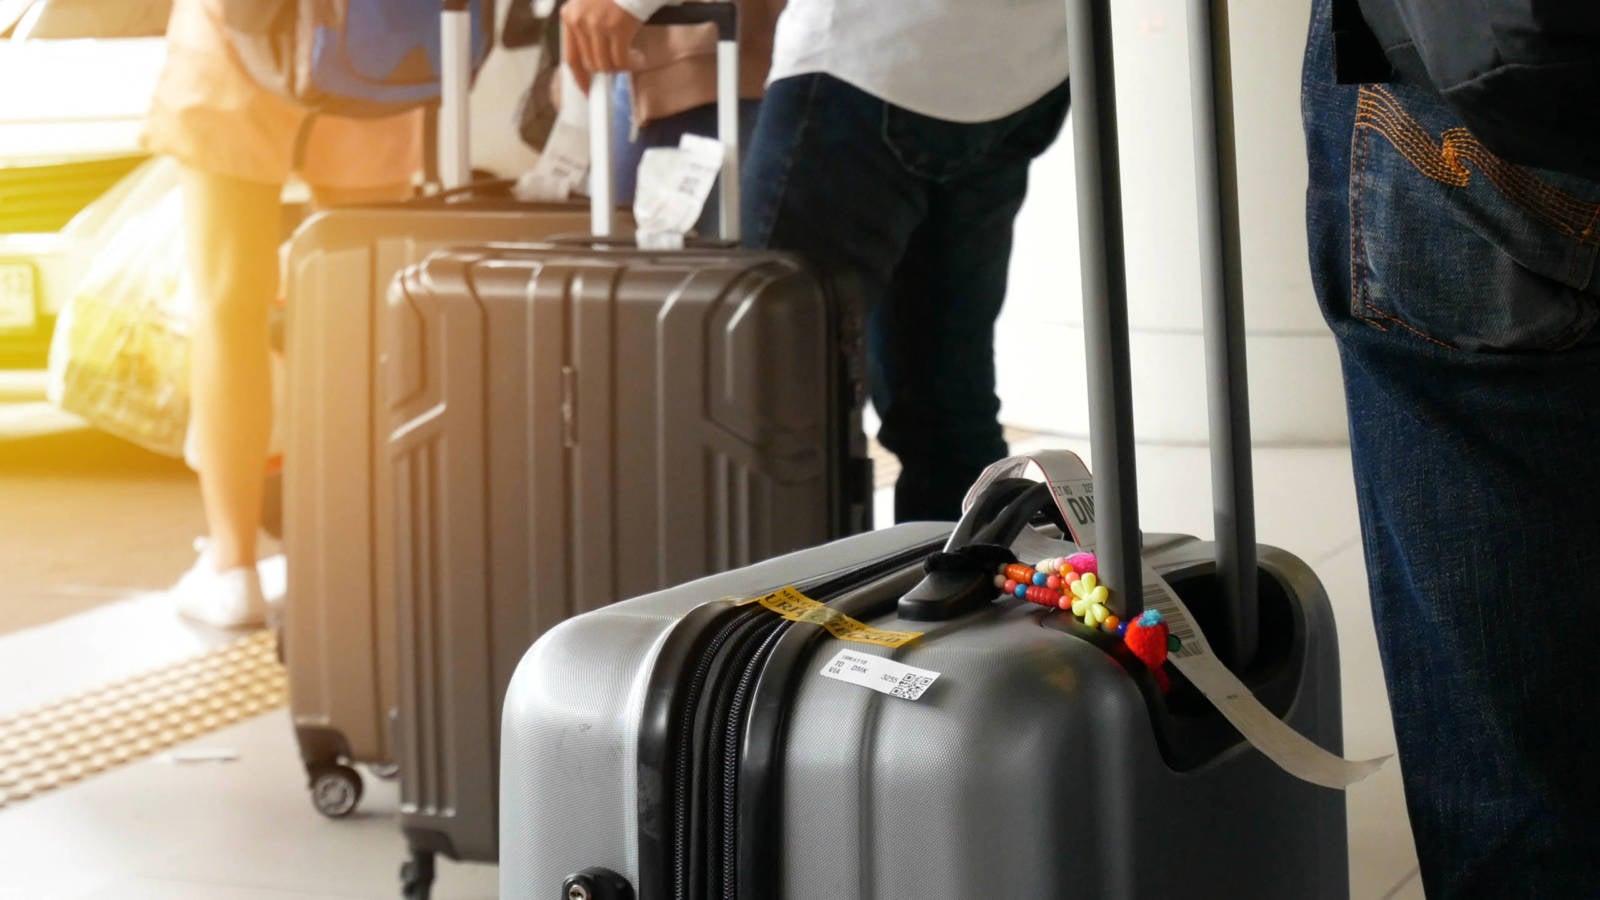 Prime Day deal alert: Half-off Samsonite, Victorinox, AmazonBasics and American Tourister luggage